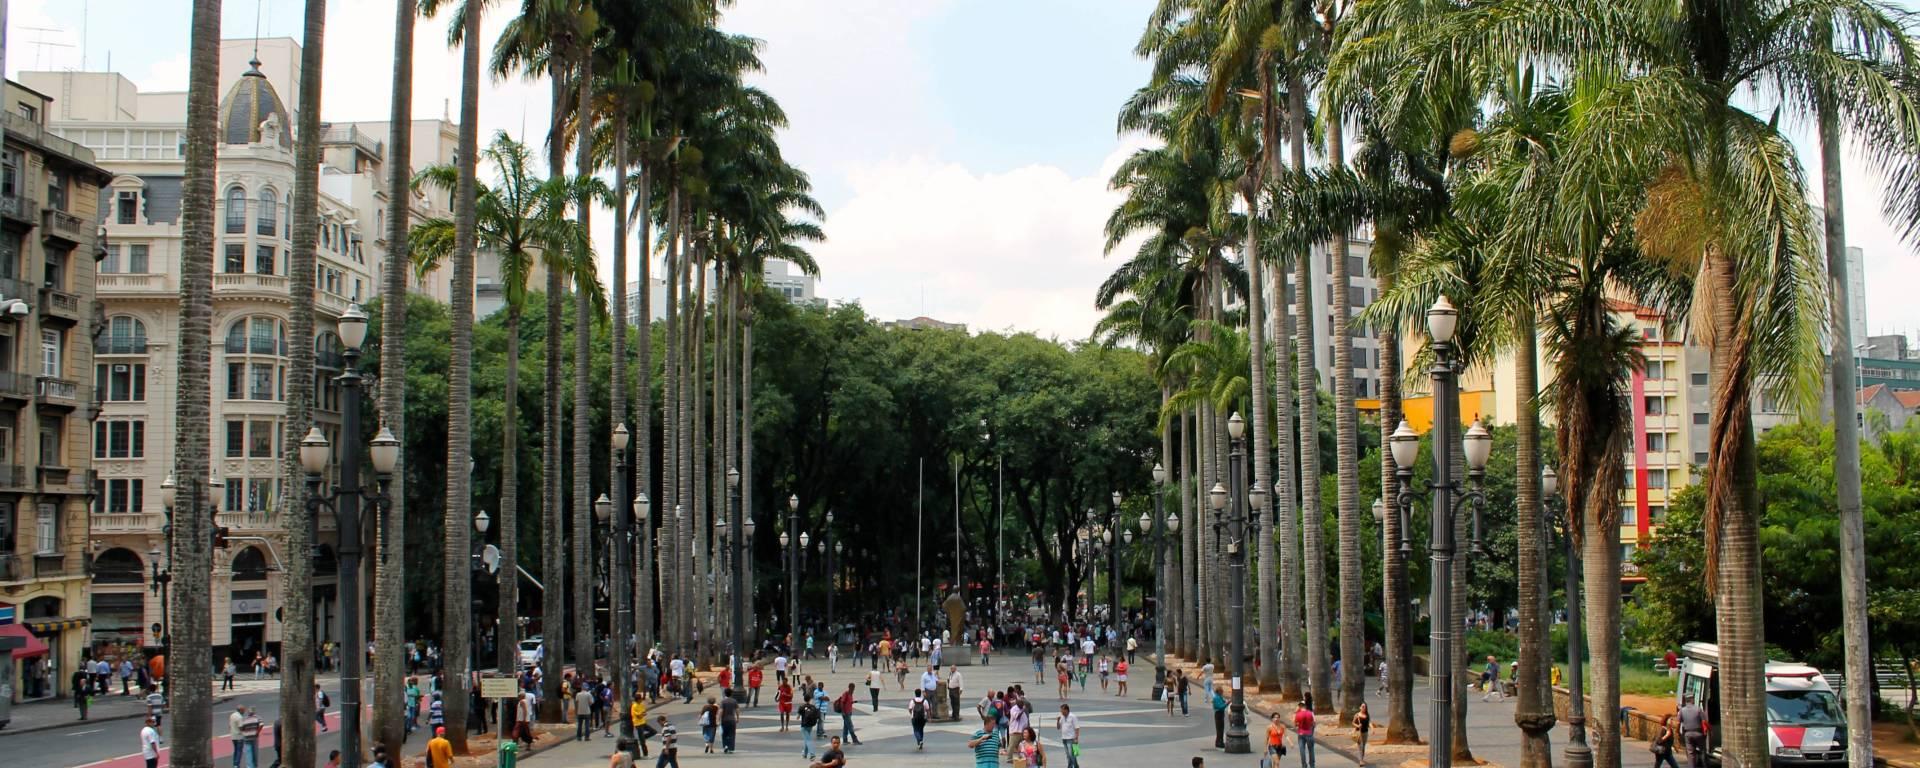 Brazil, São Paulo, exploration